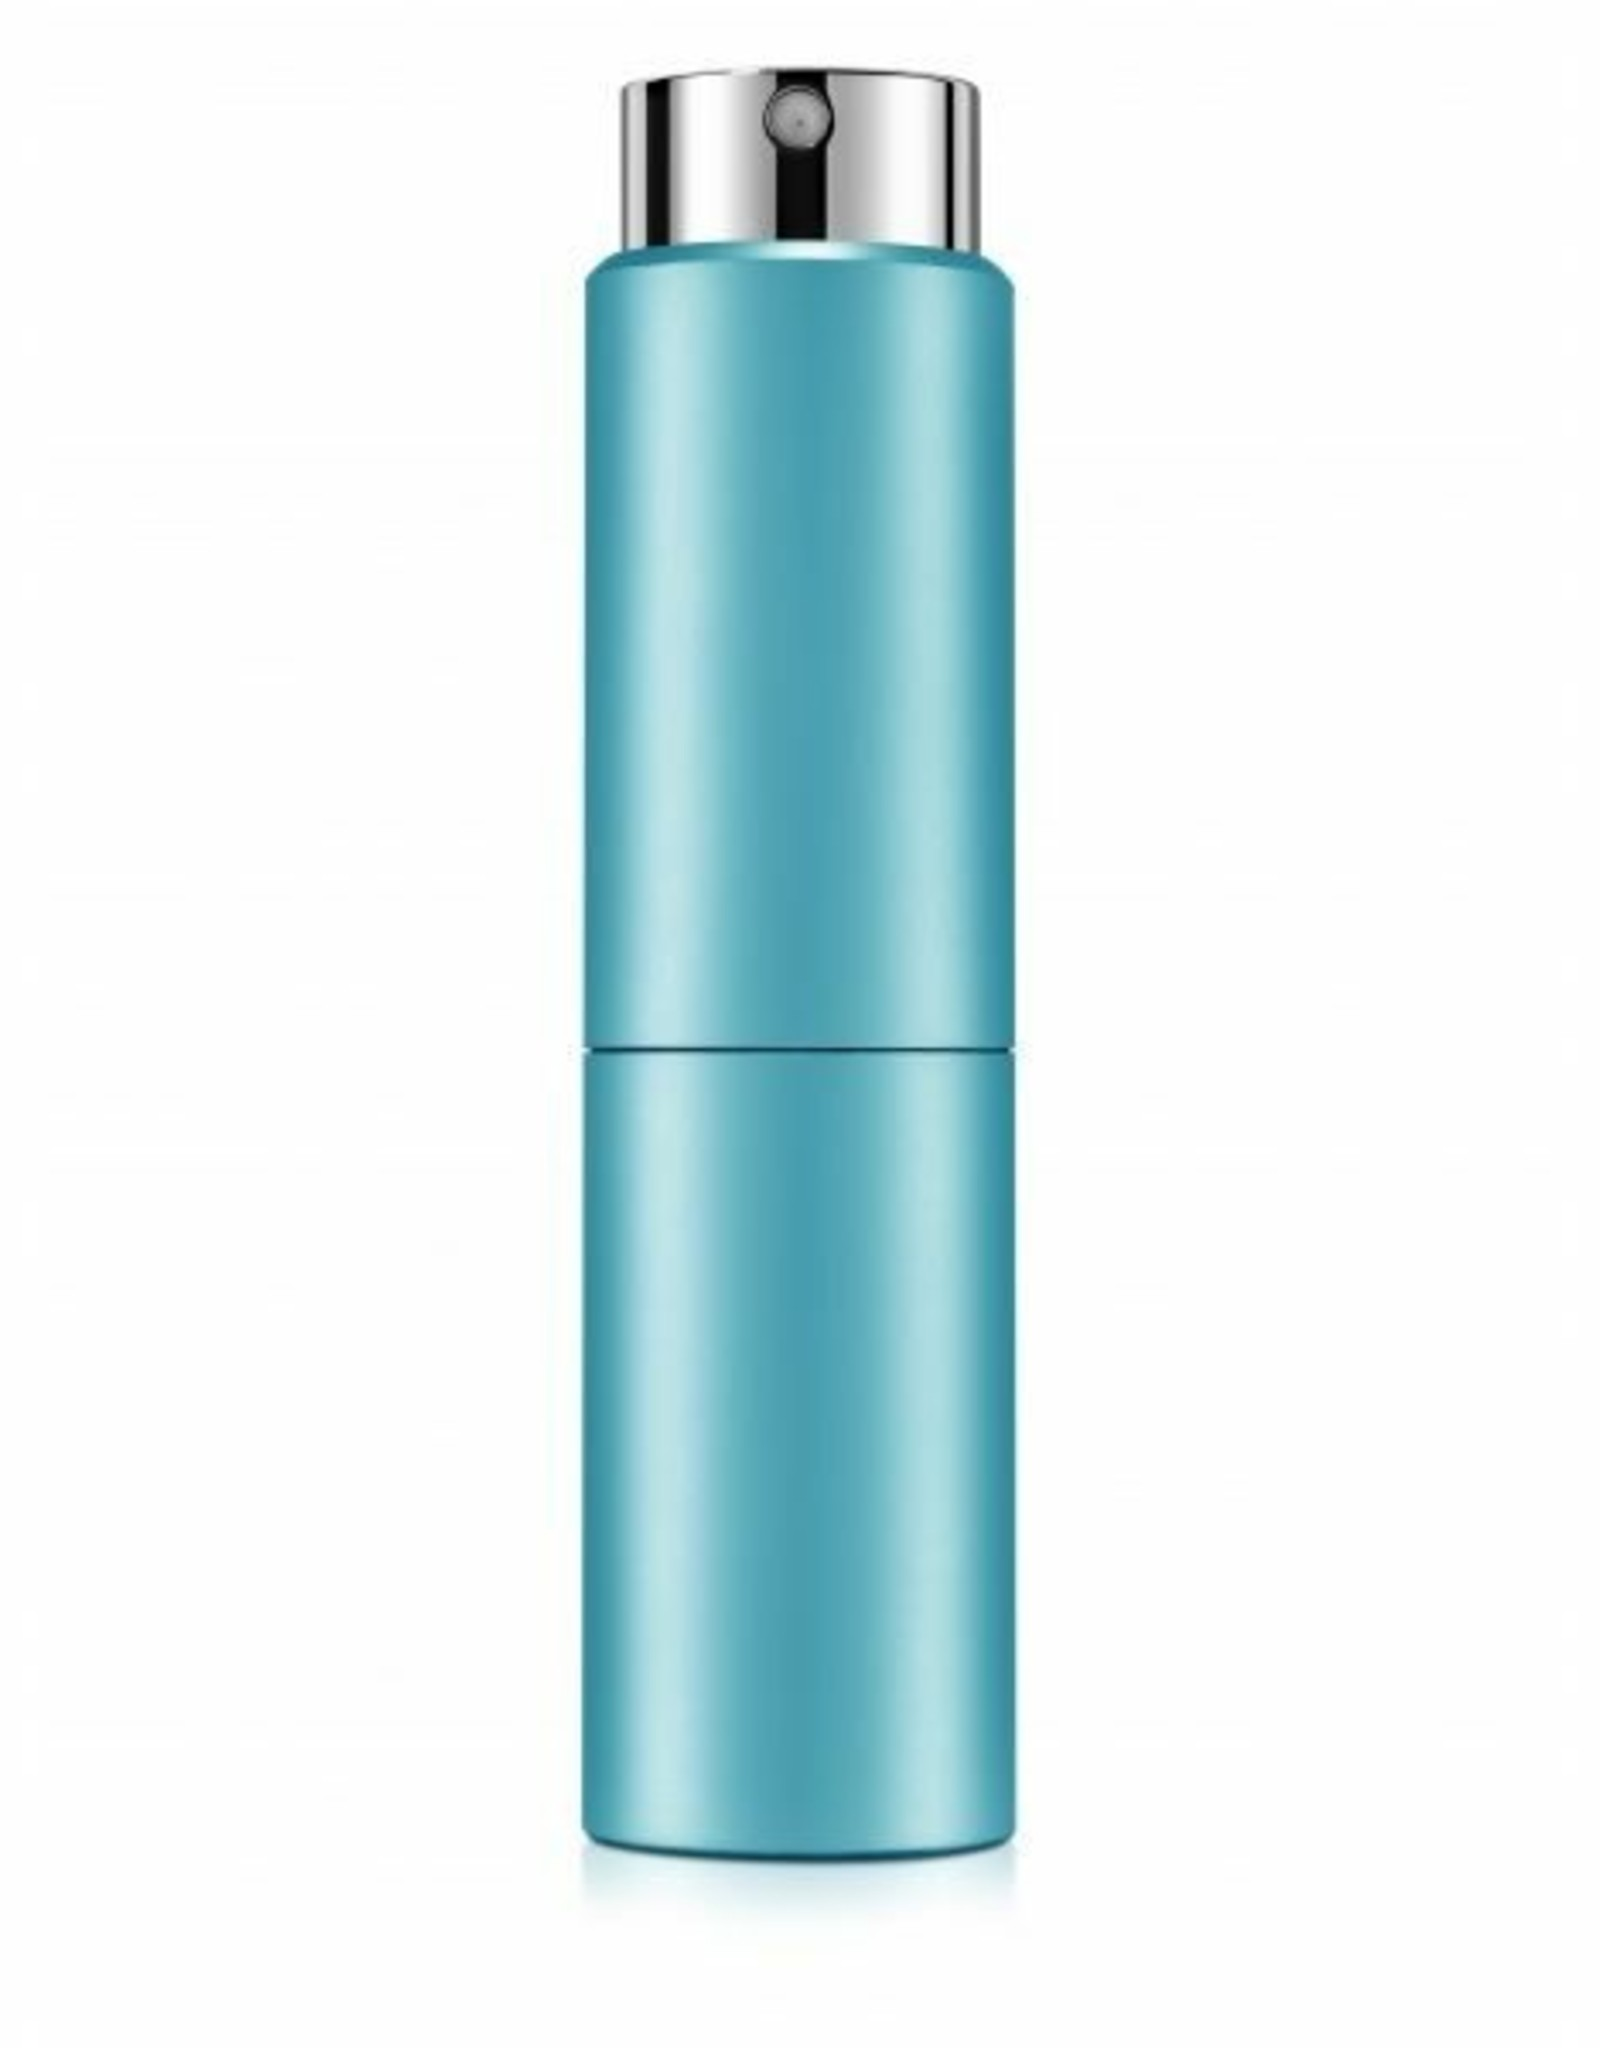 Equivalenza Blue Perfume Atomizer - 15ml